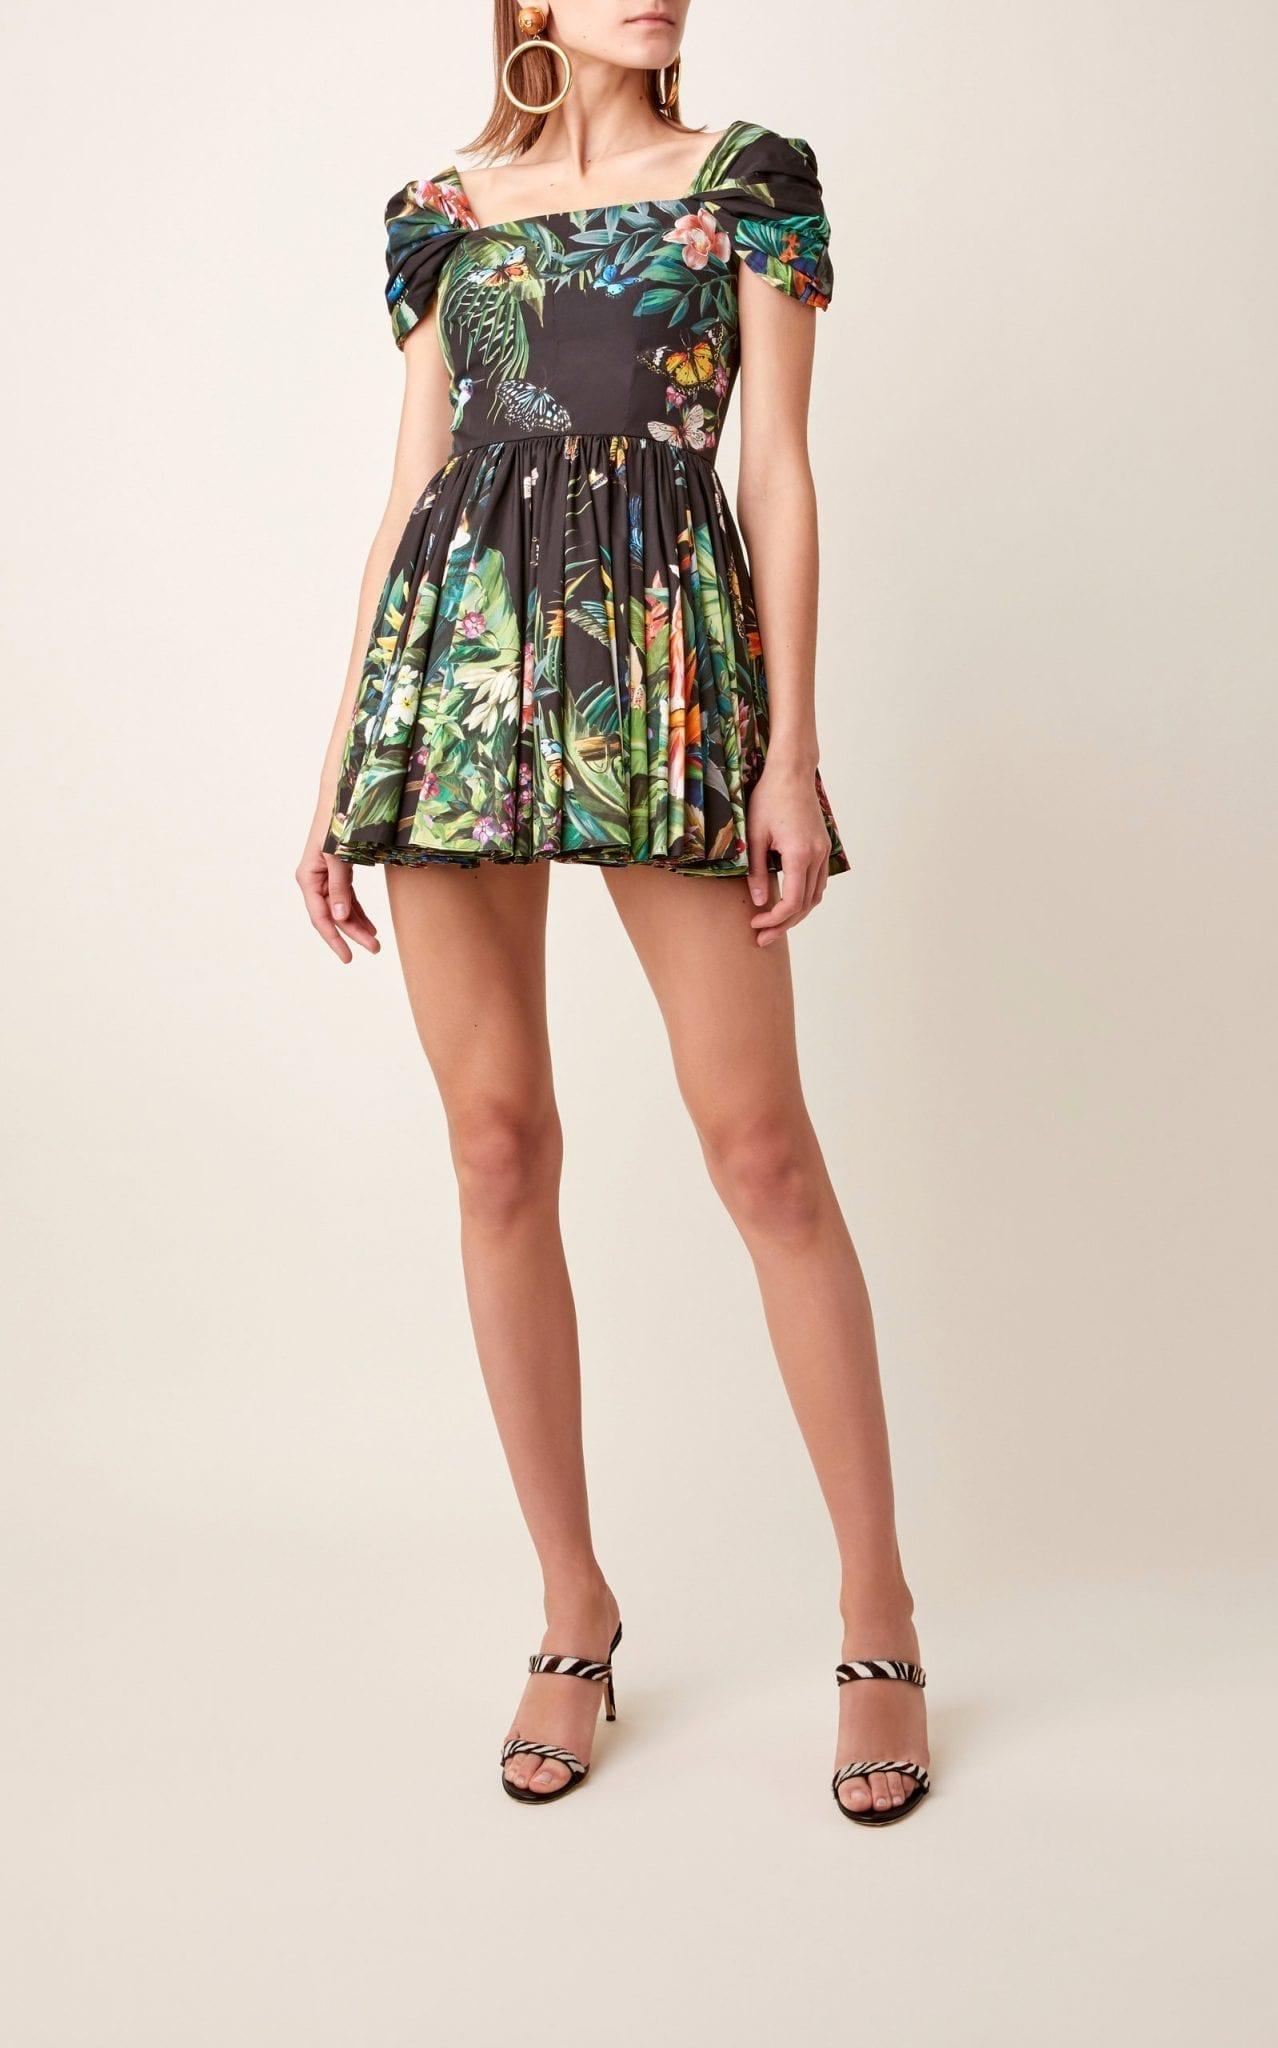 DOLCE & GABBANA Printed Cotton-Poplin Mini Dress